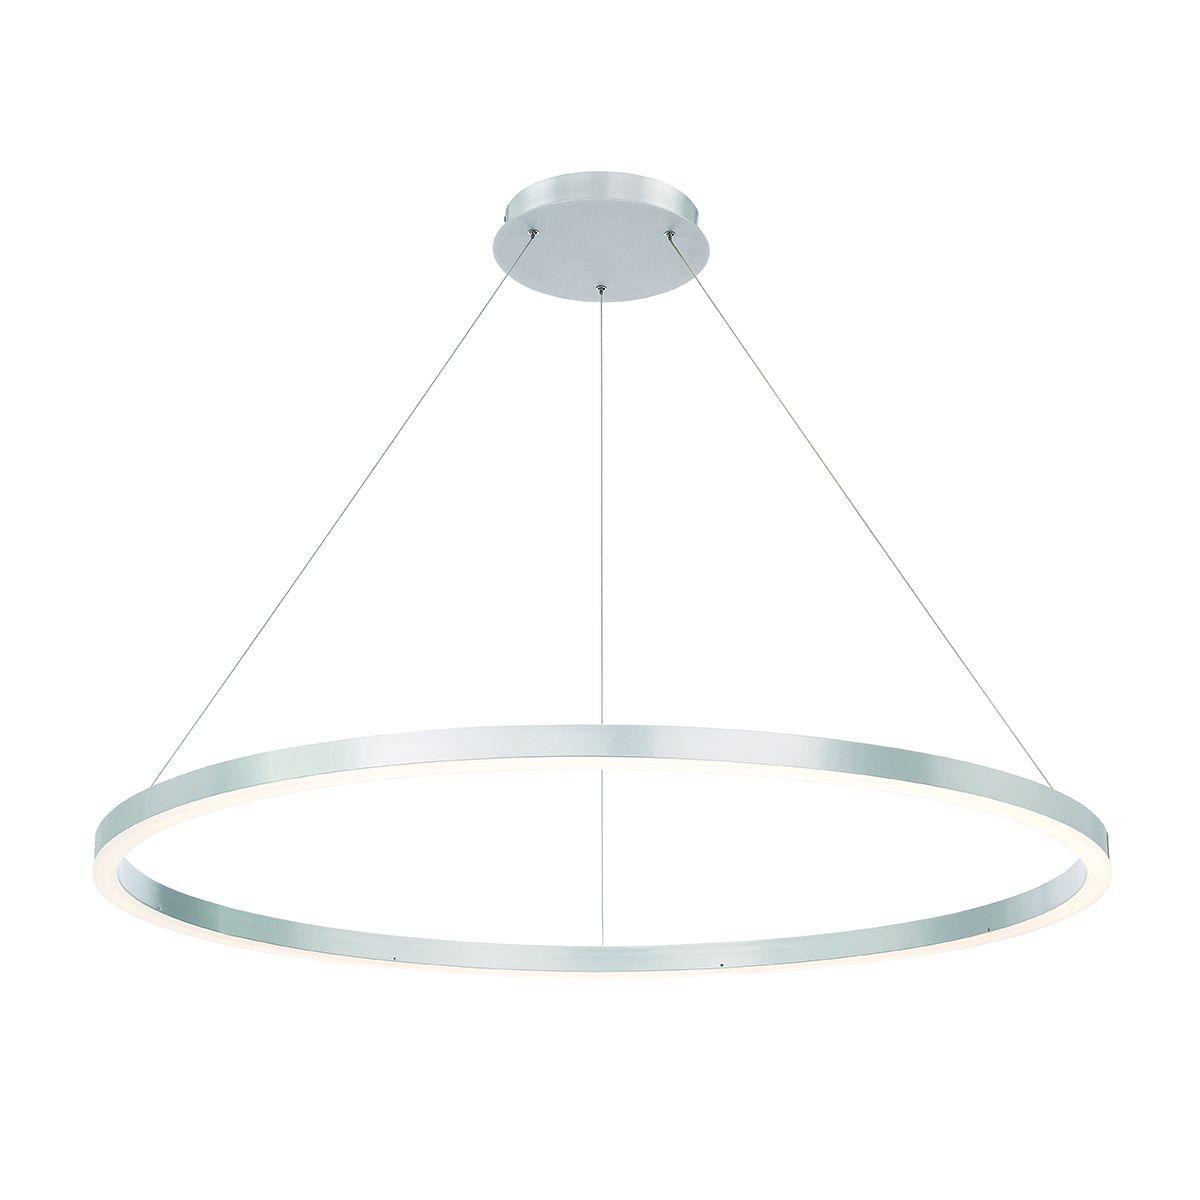 Alcon Lighting 12232 Cirkel Medium 47 25 Inches LED Architectural Suspended  Pendant